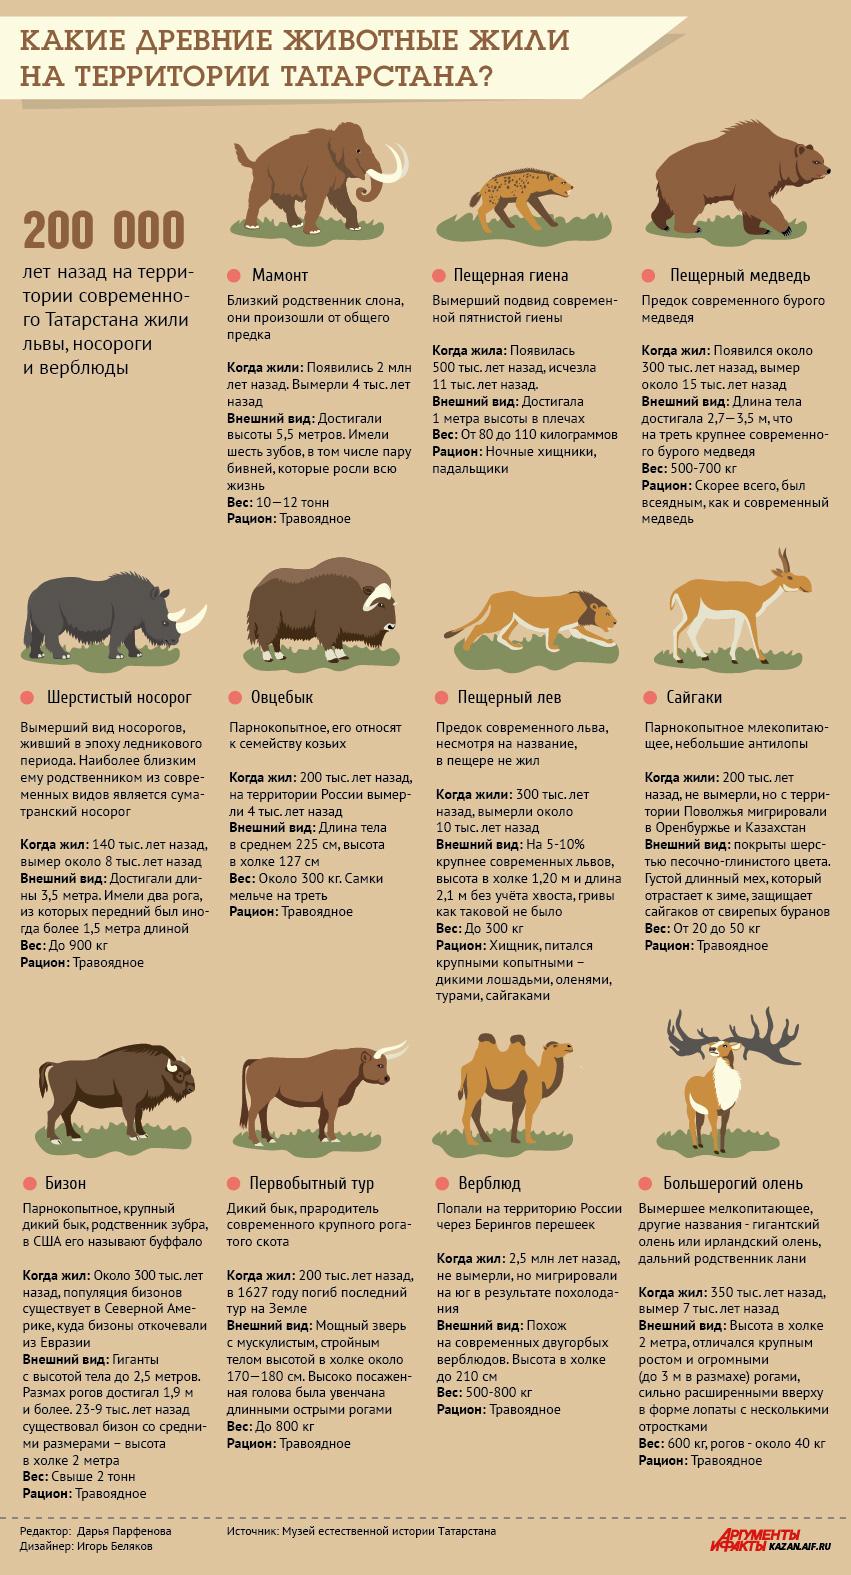 инфографика. кто жил на территории татарстана 200 000 лет назад